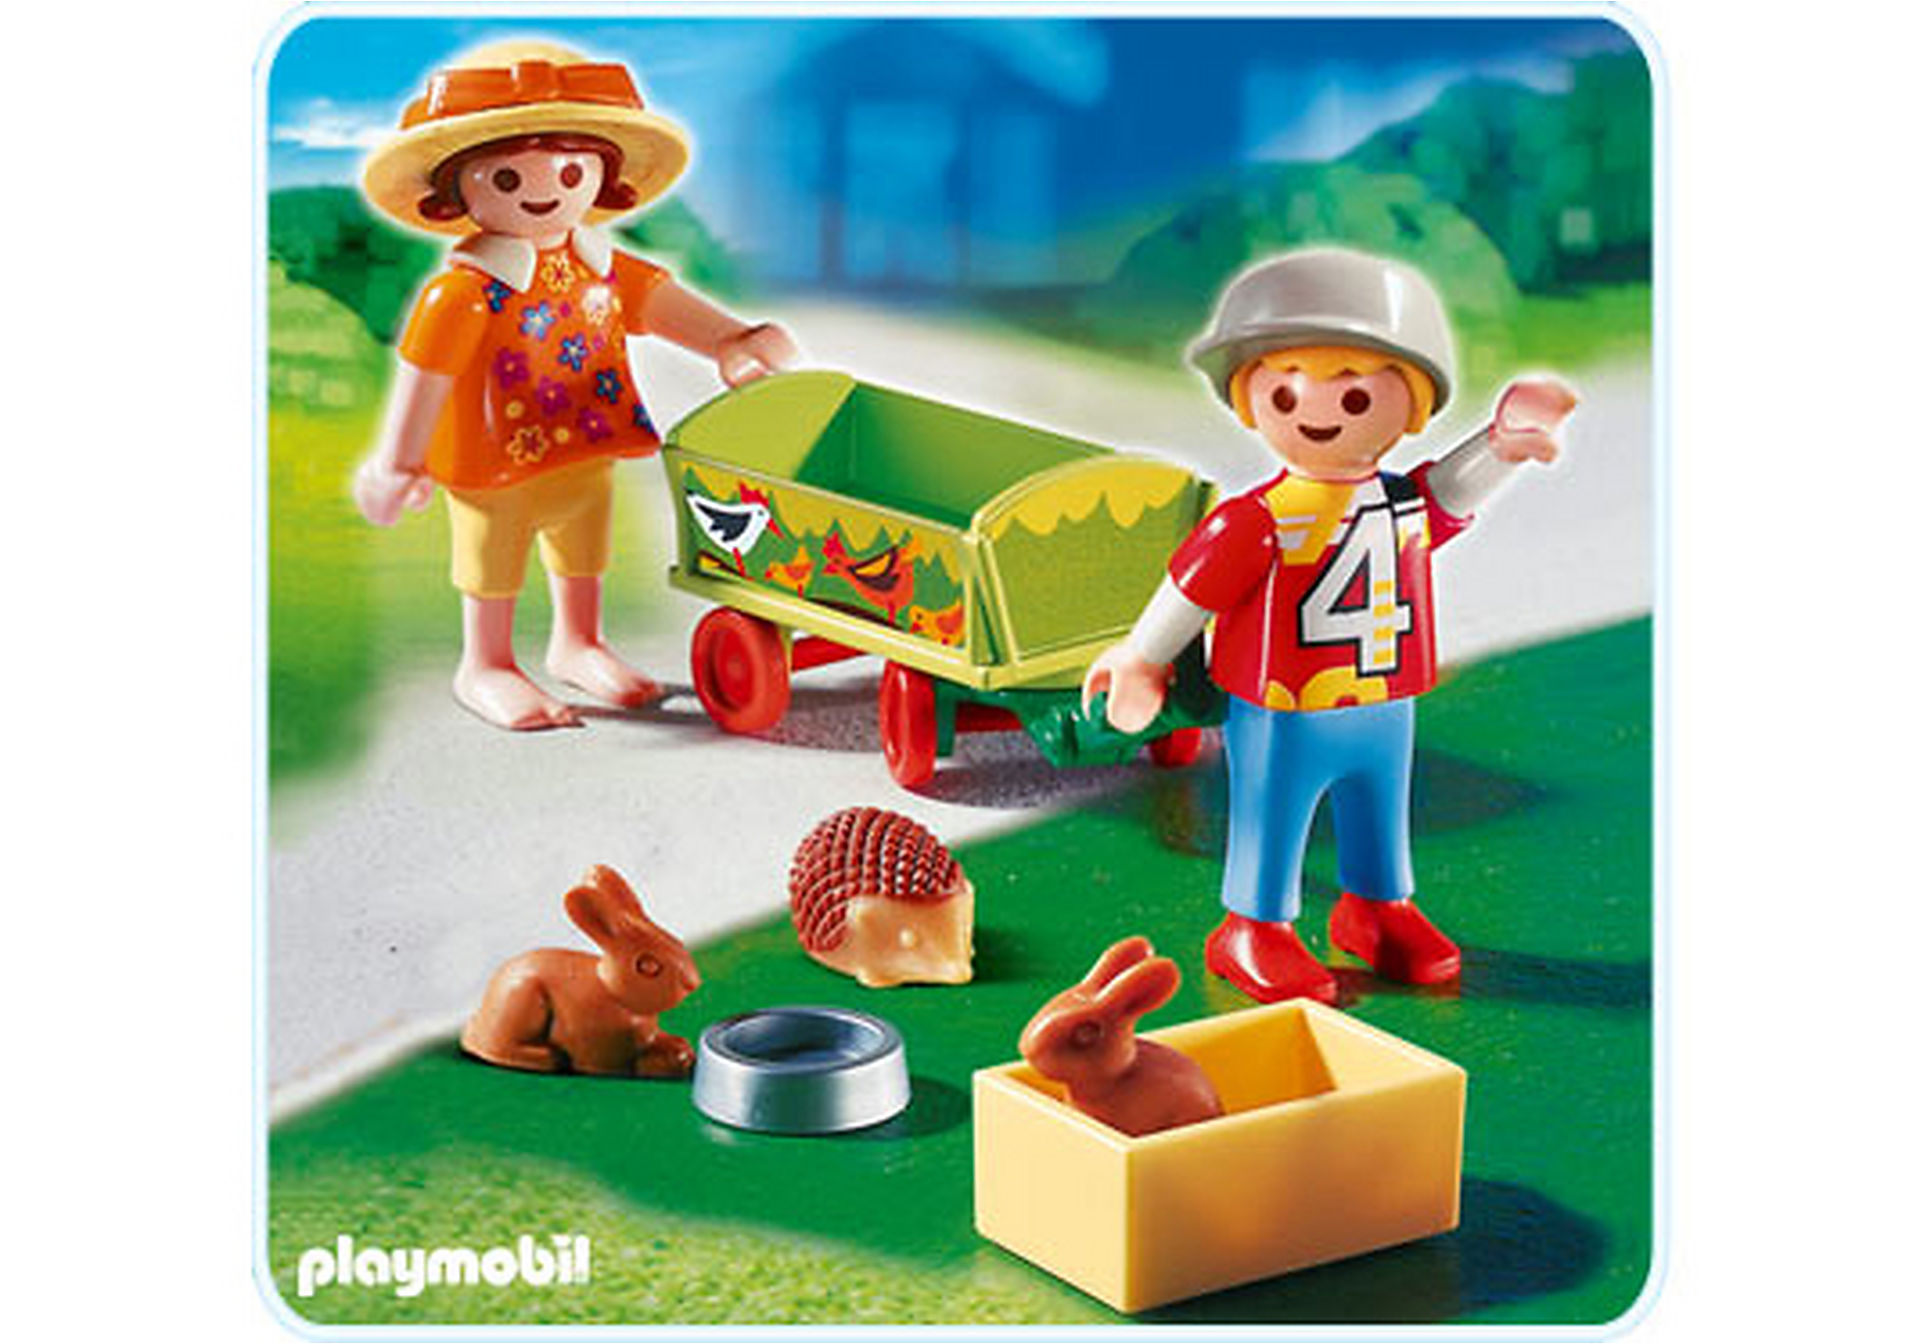 http://media.playmobil.com/i/playmobil/4349-A_product_detail/Bollerwagen mit Kleintieren